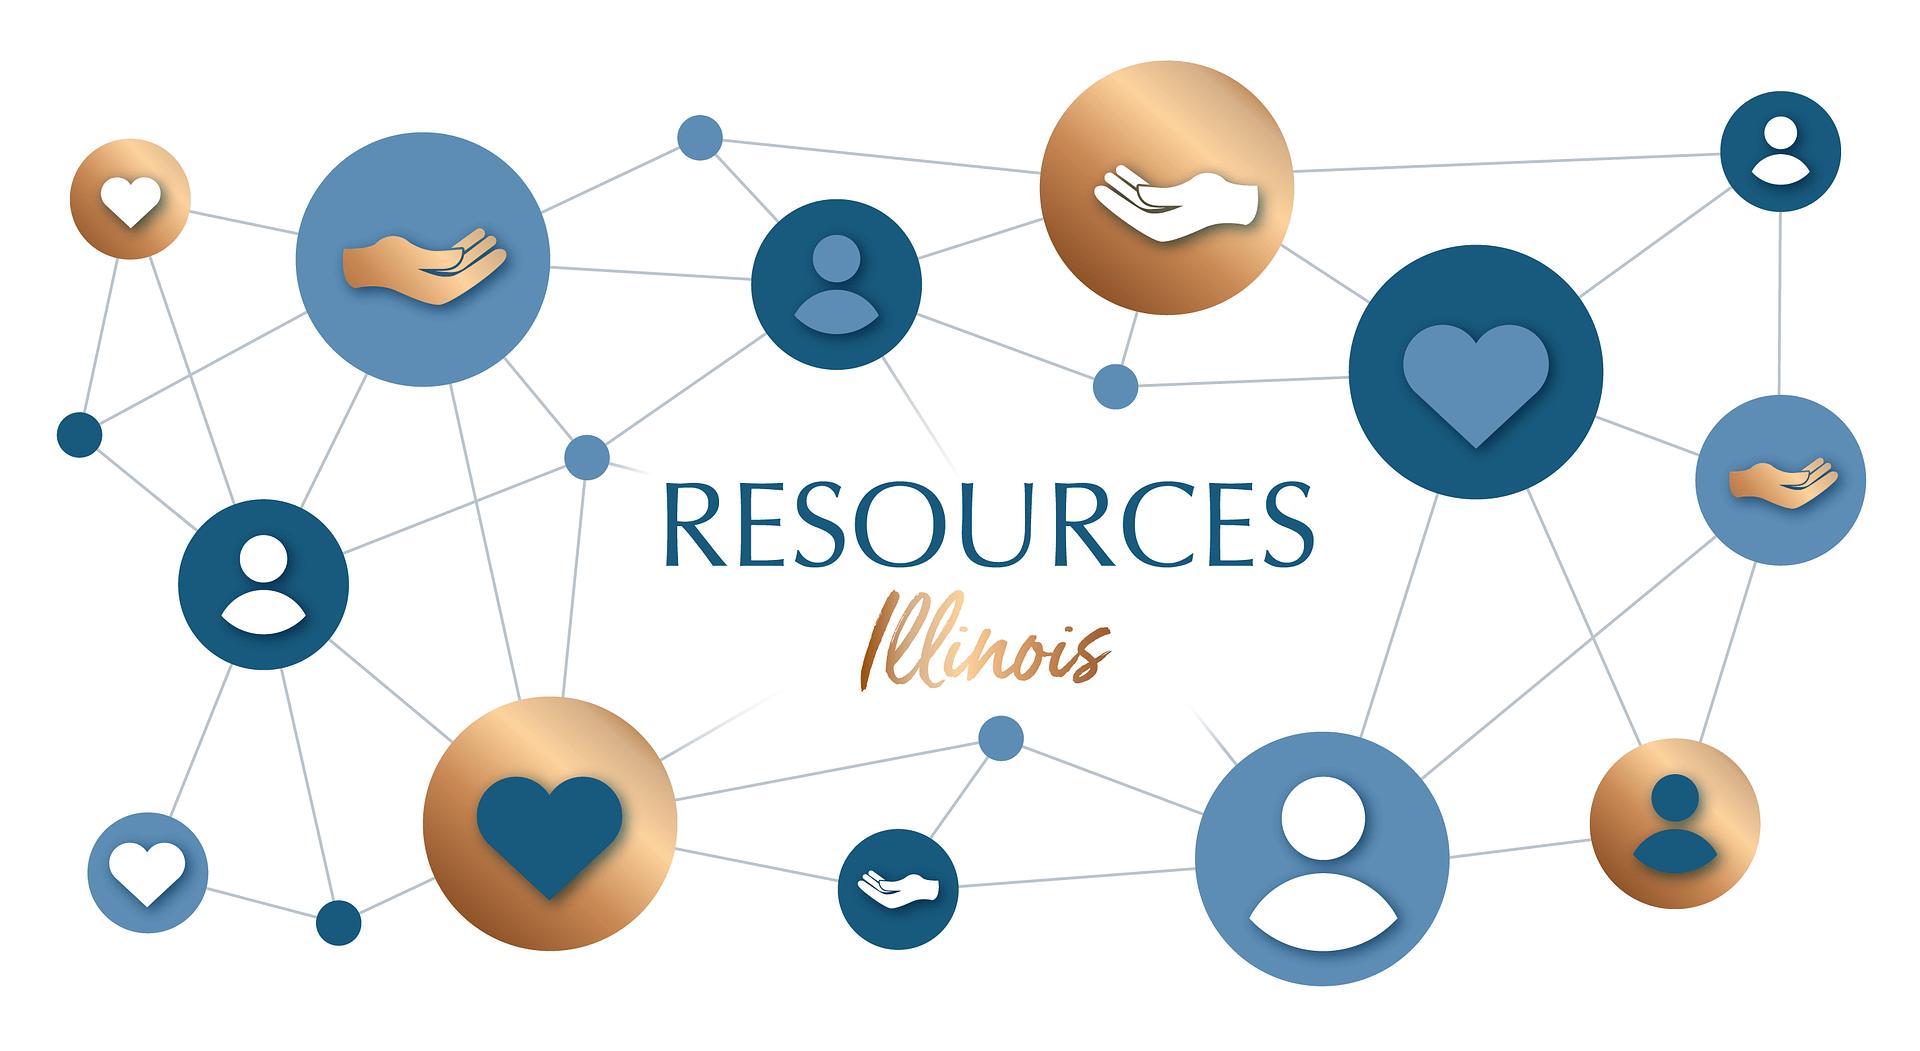 Resources_Illinois-Header